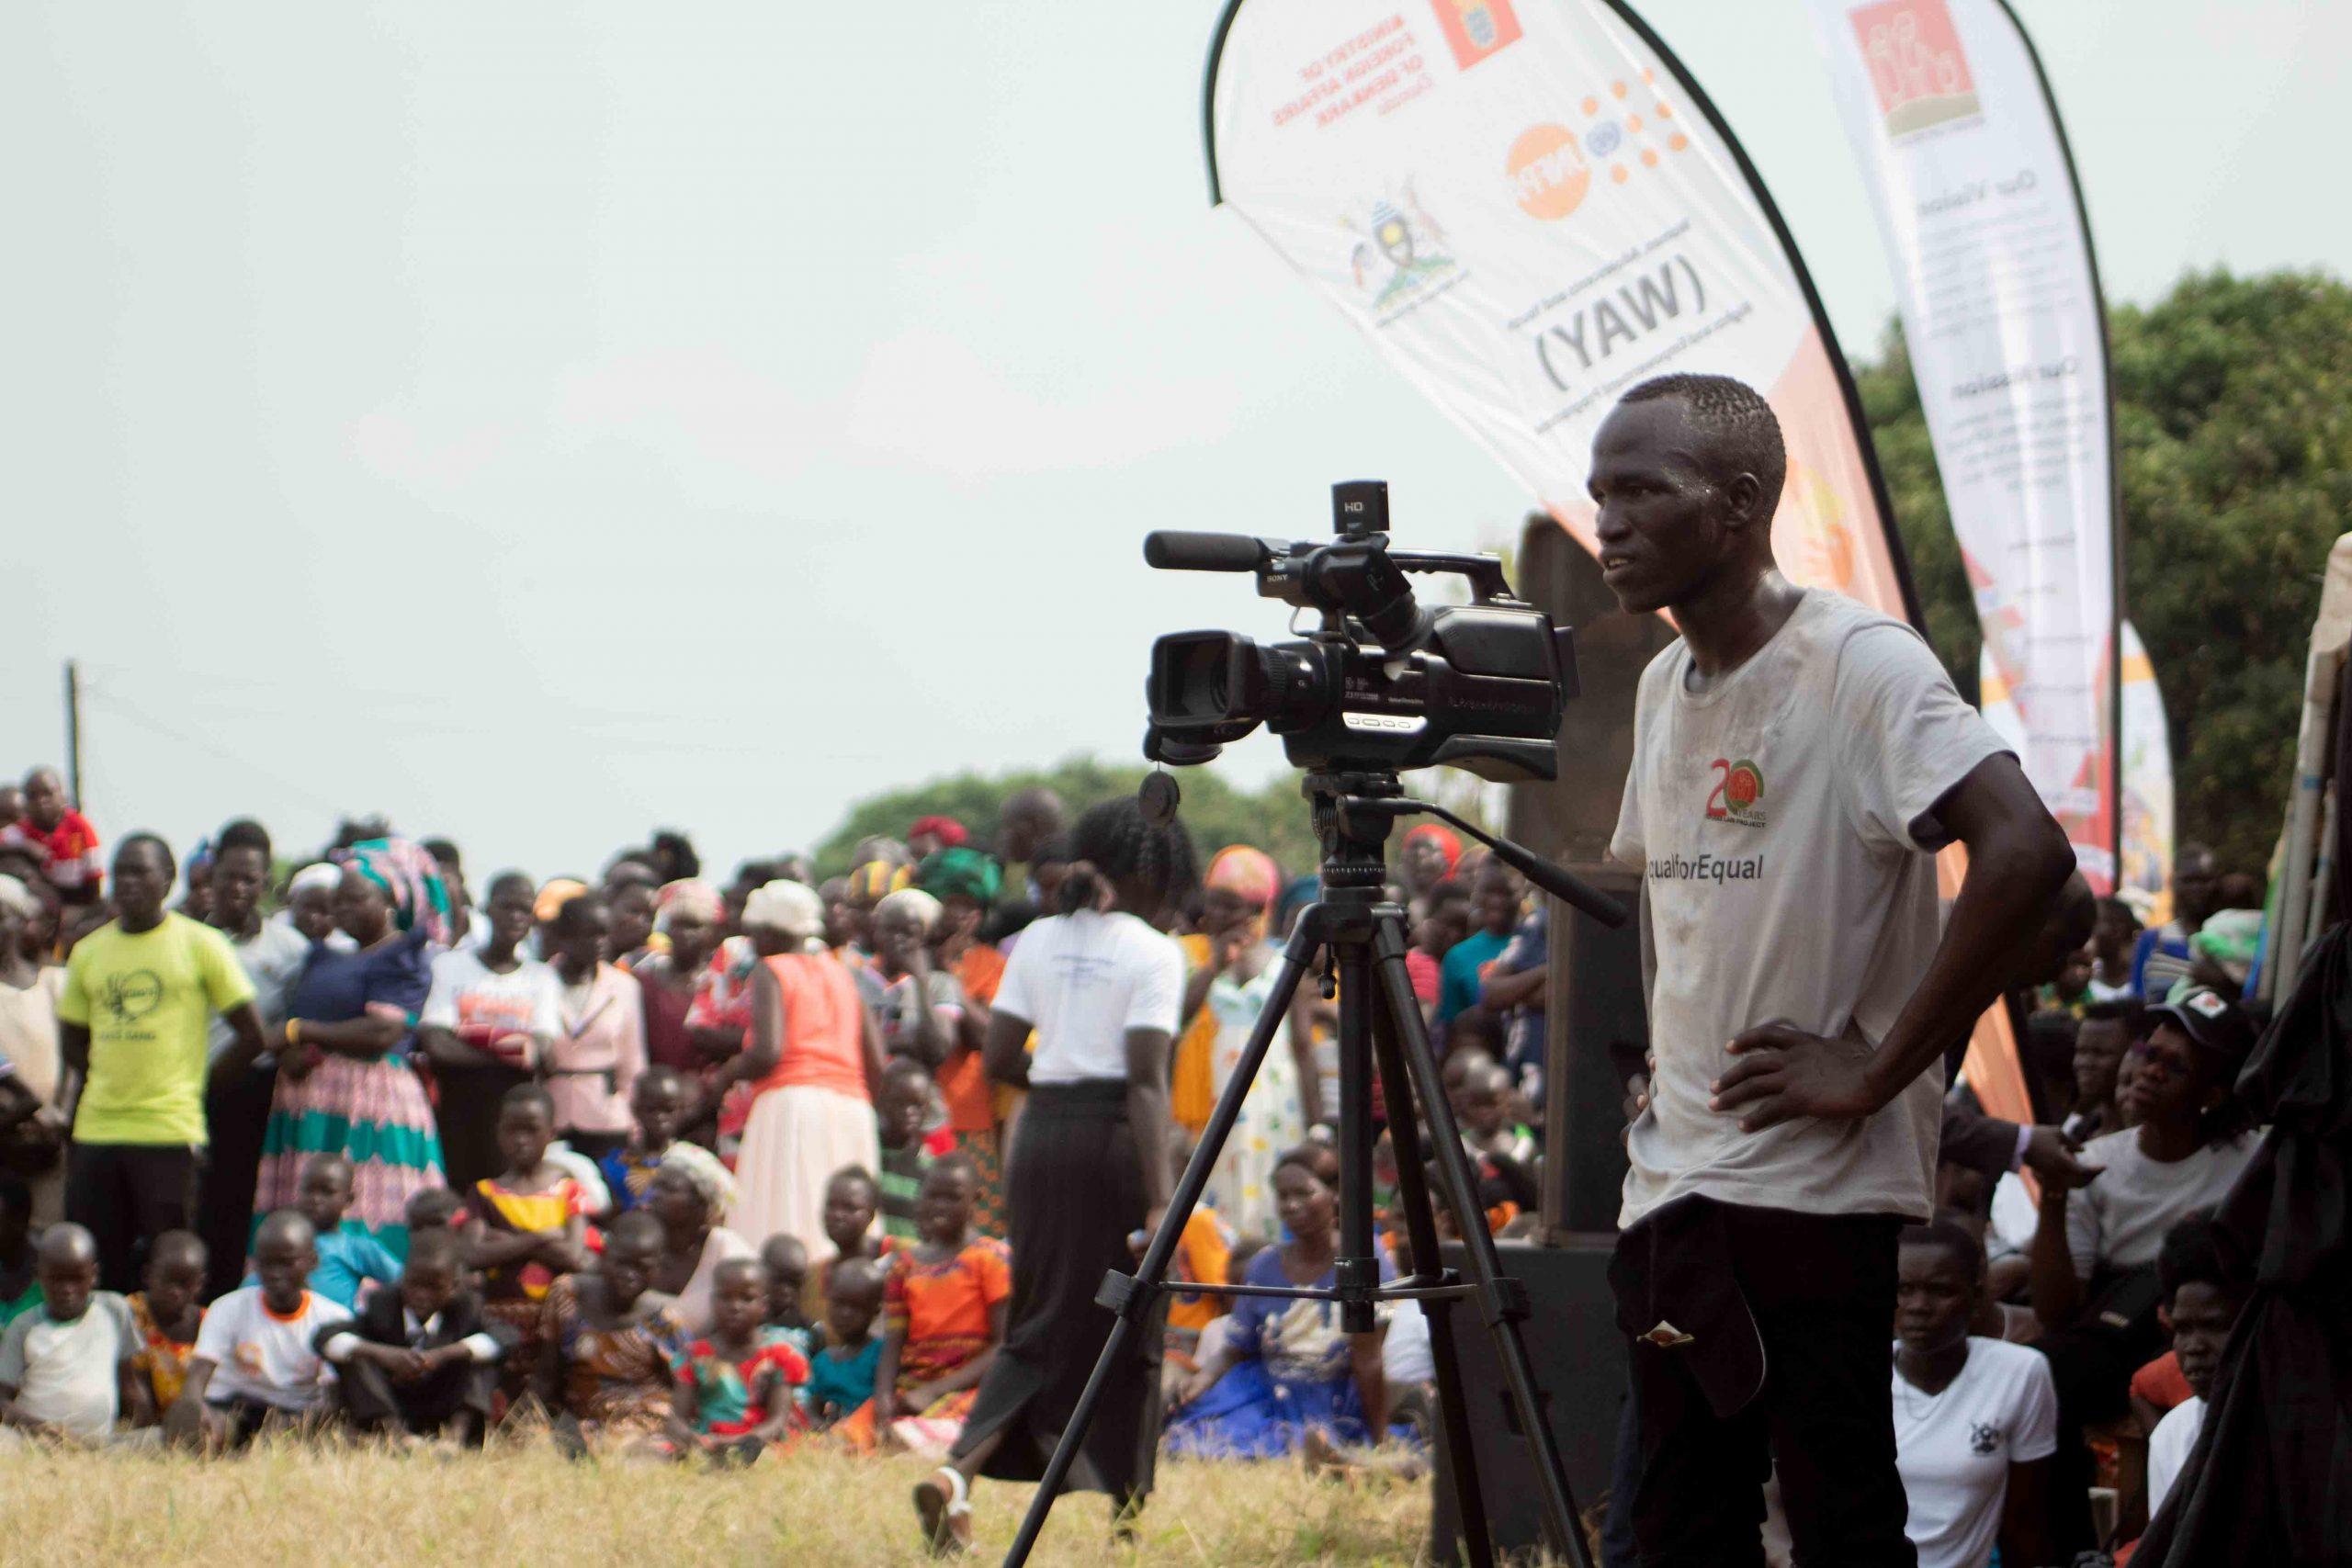 Video Advocate with Camera_onendavid.com